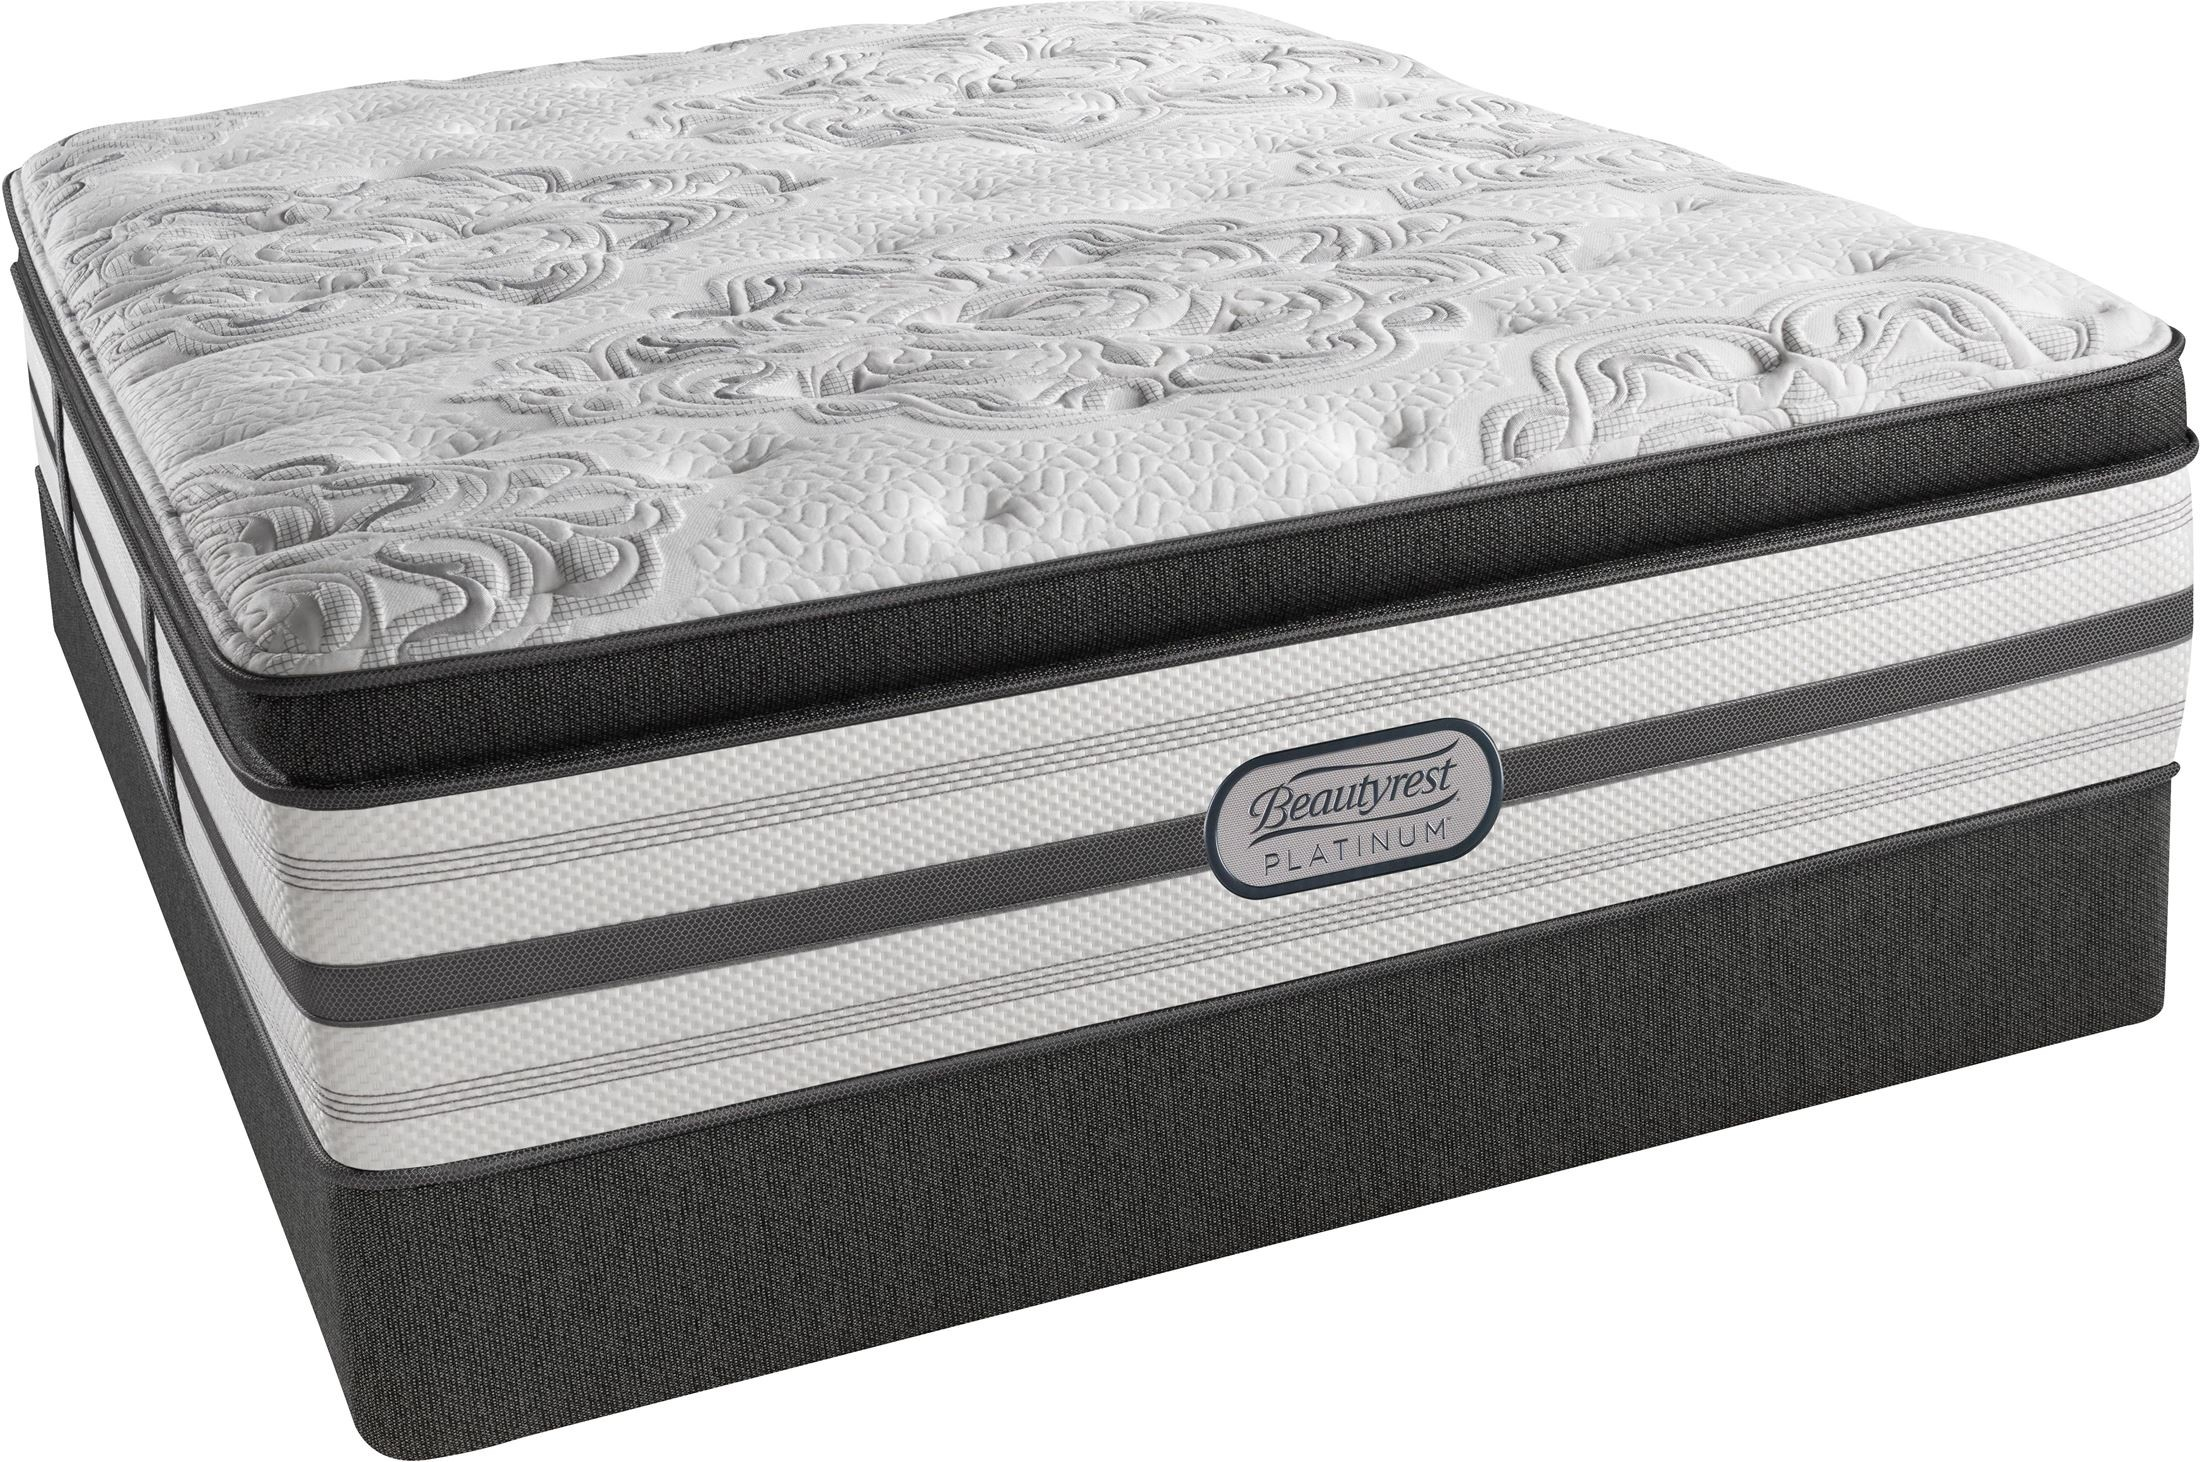 Beautyrest Recharge Platinum Gatsby Pillow Top Luxury Firm